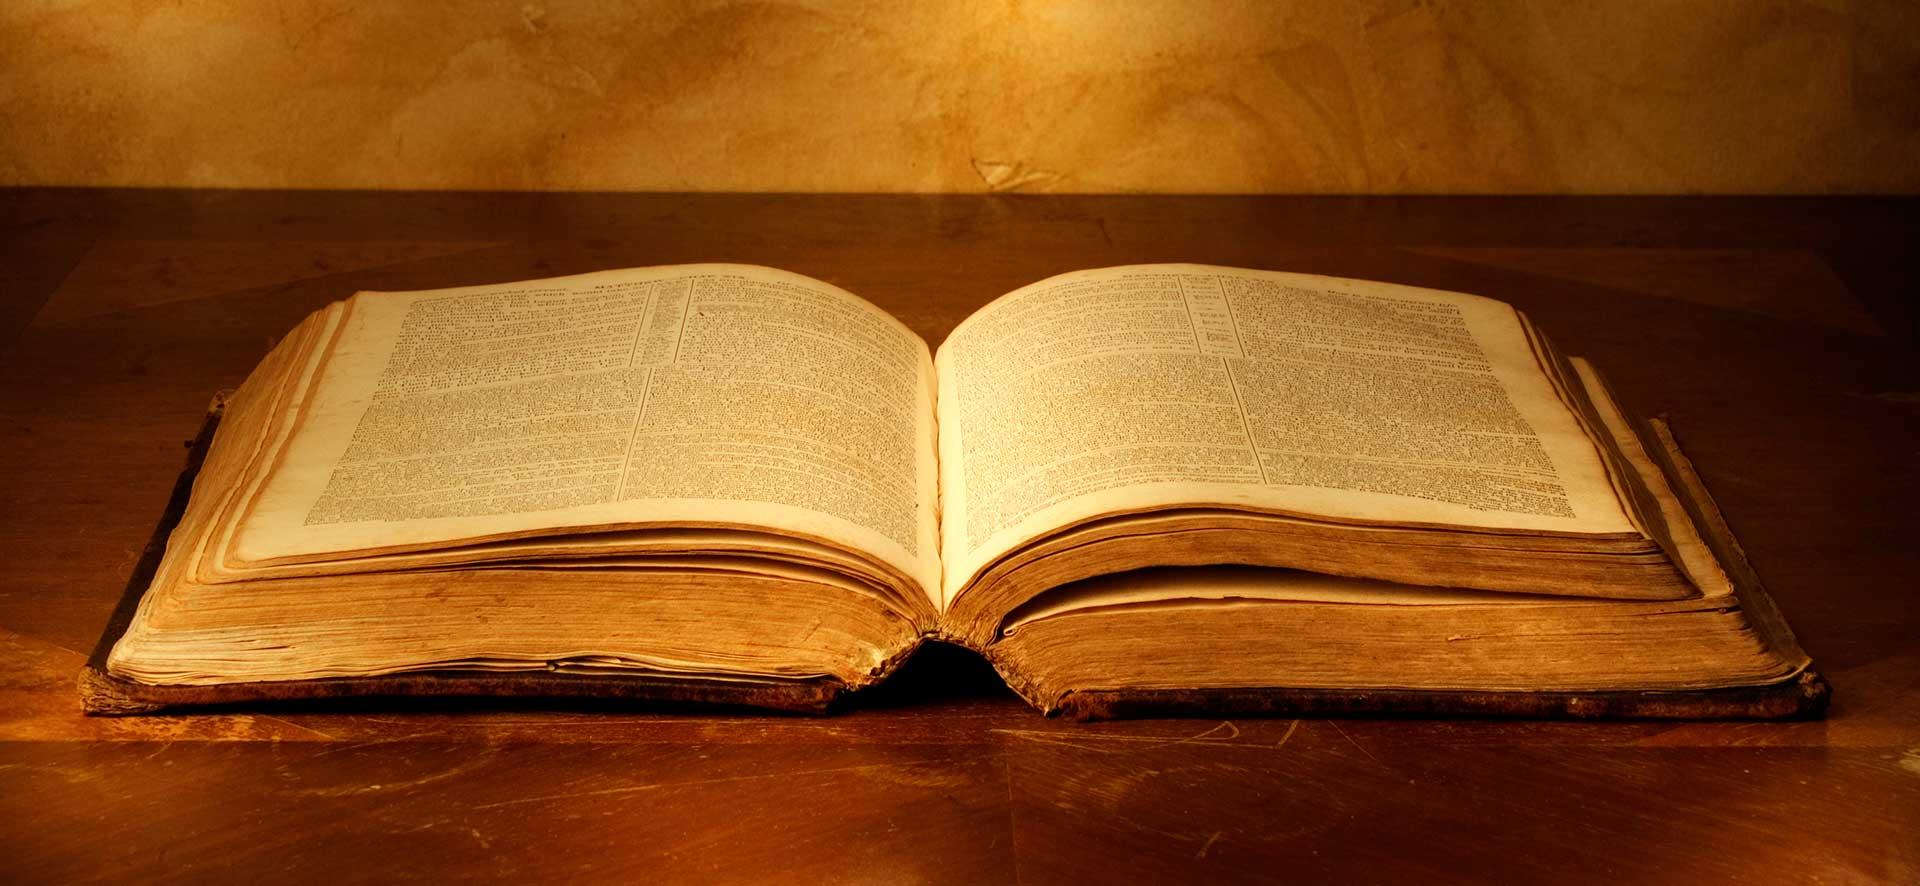 Bible Background Biblebackgroundnarrower 1920x886